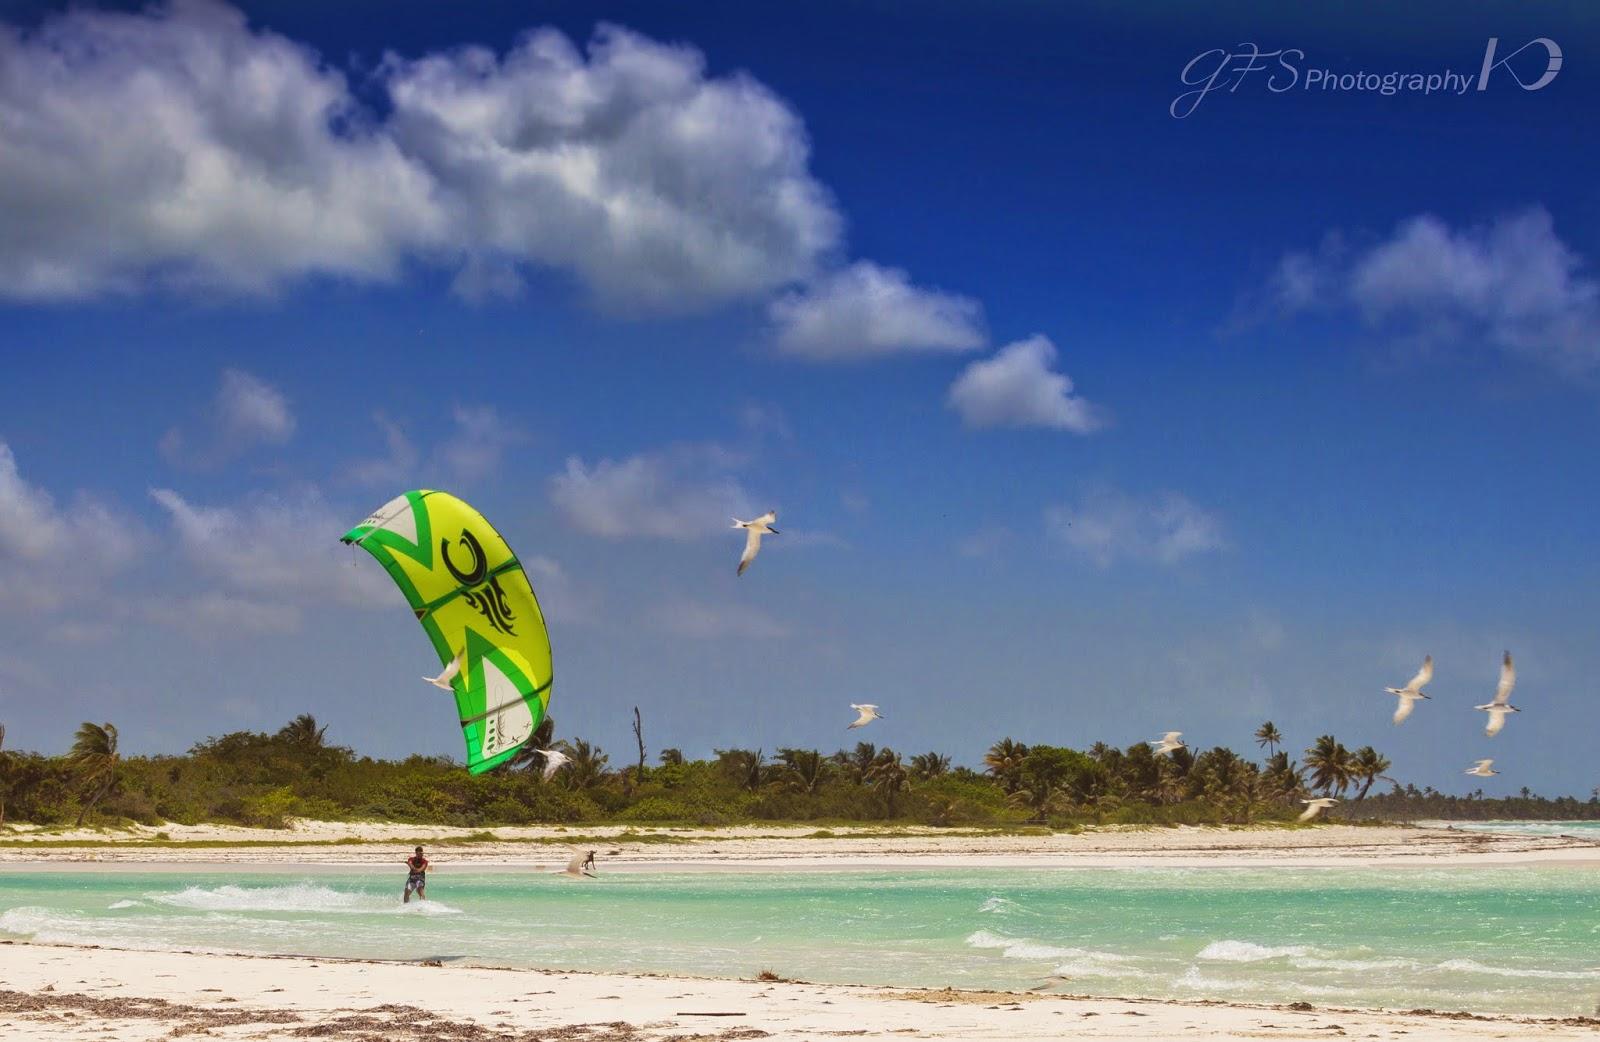 boca paila esturay sian ka'an kitesurf spot kiteboarding